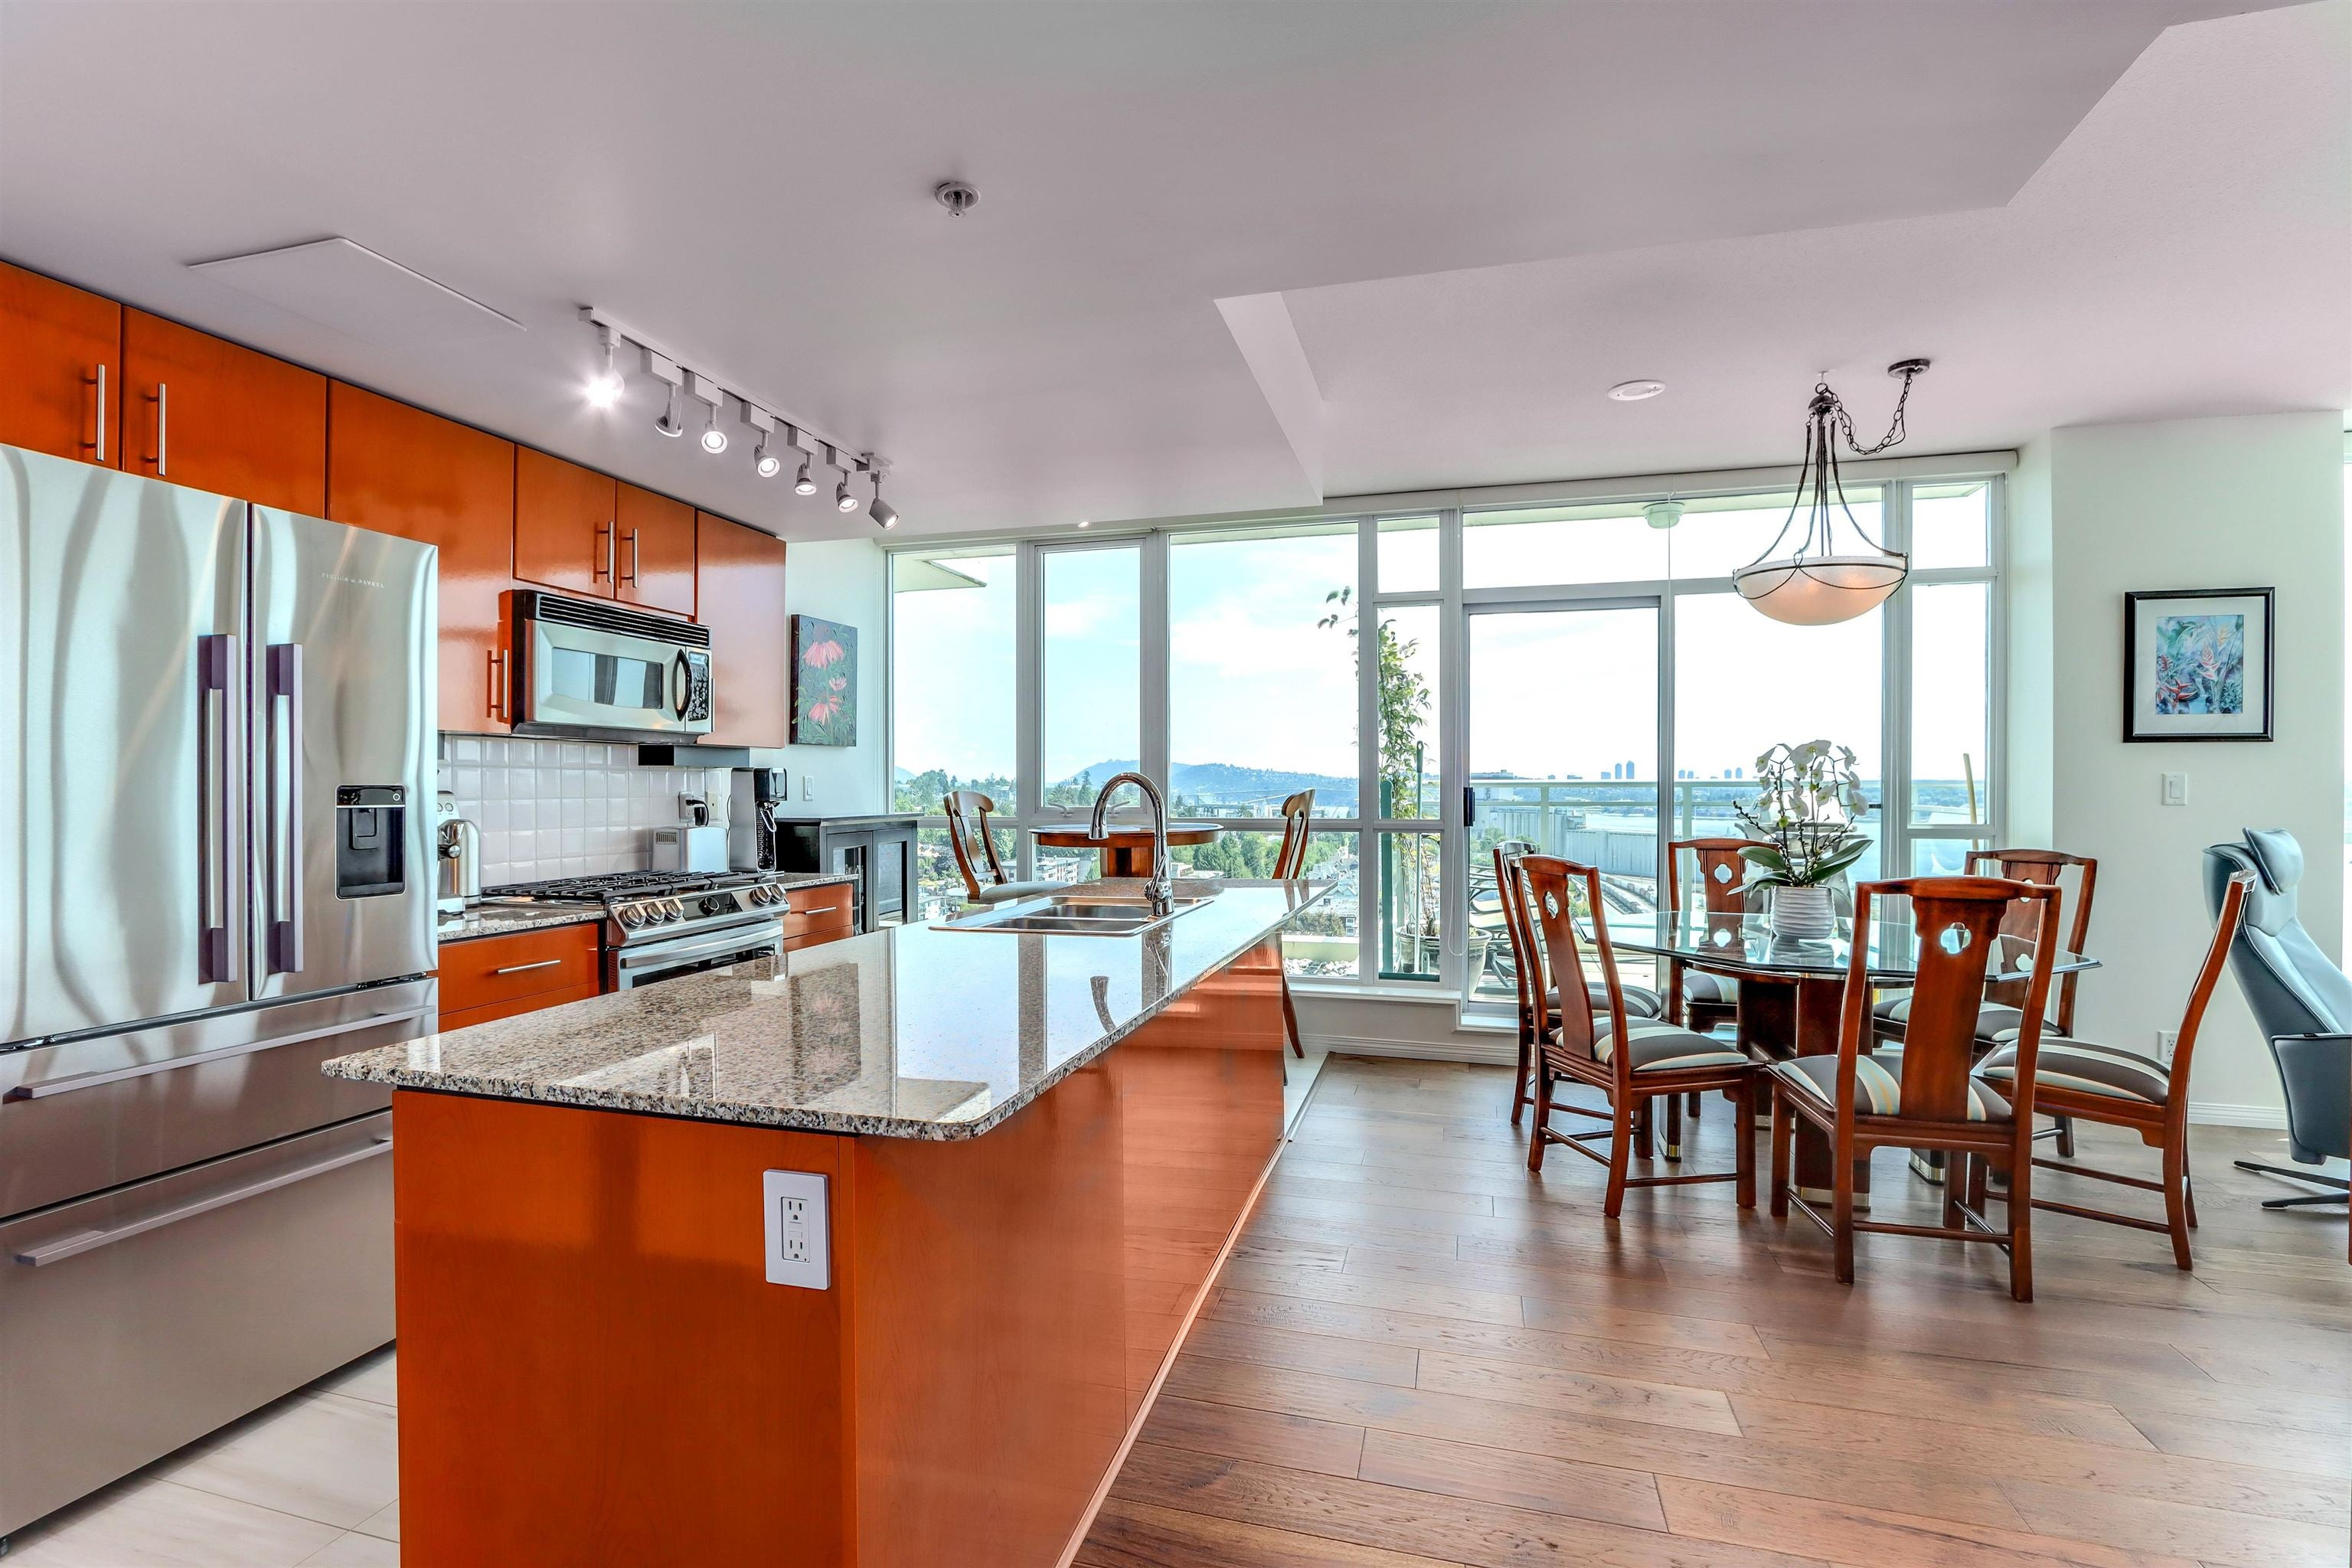 2202 188 E ESPLANADE - Lower Lonsdale Apartment/Condo for sale, 2 Bedrooms (R2618412) - #4